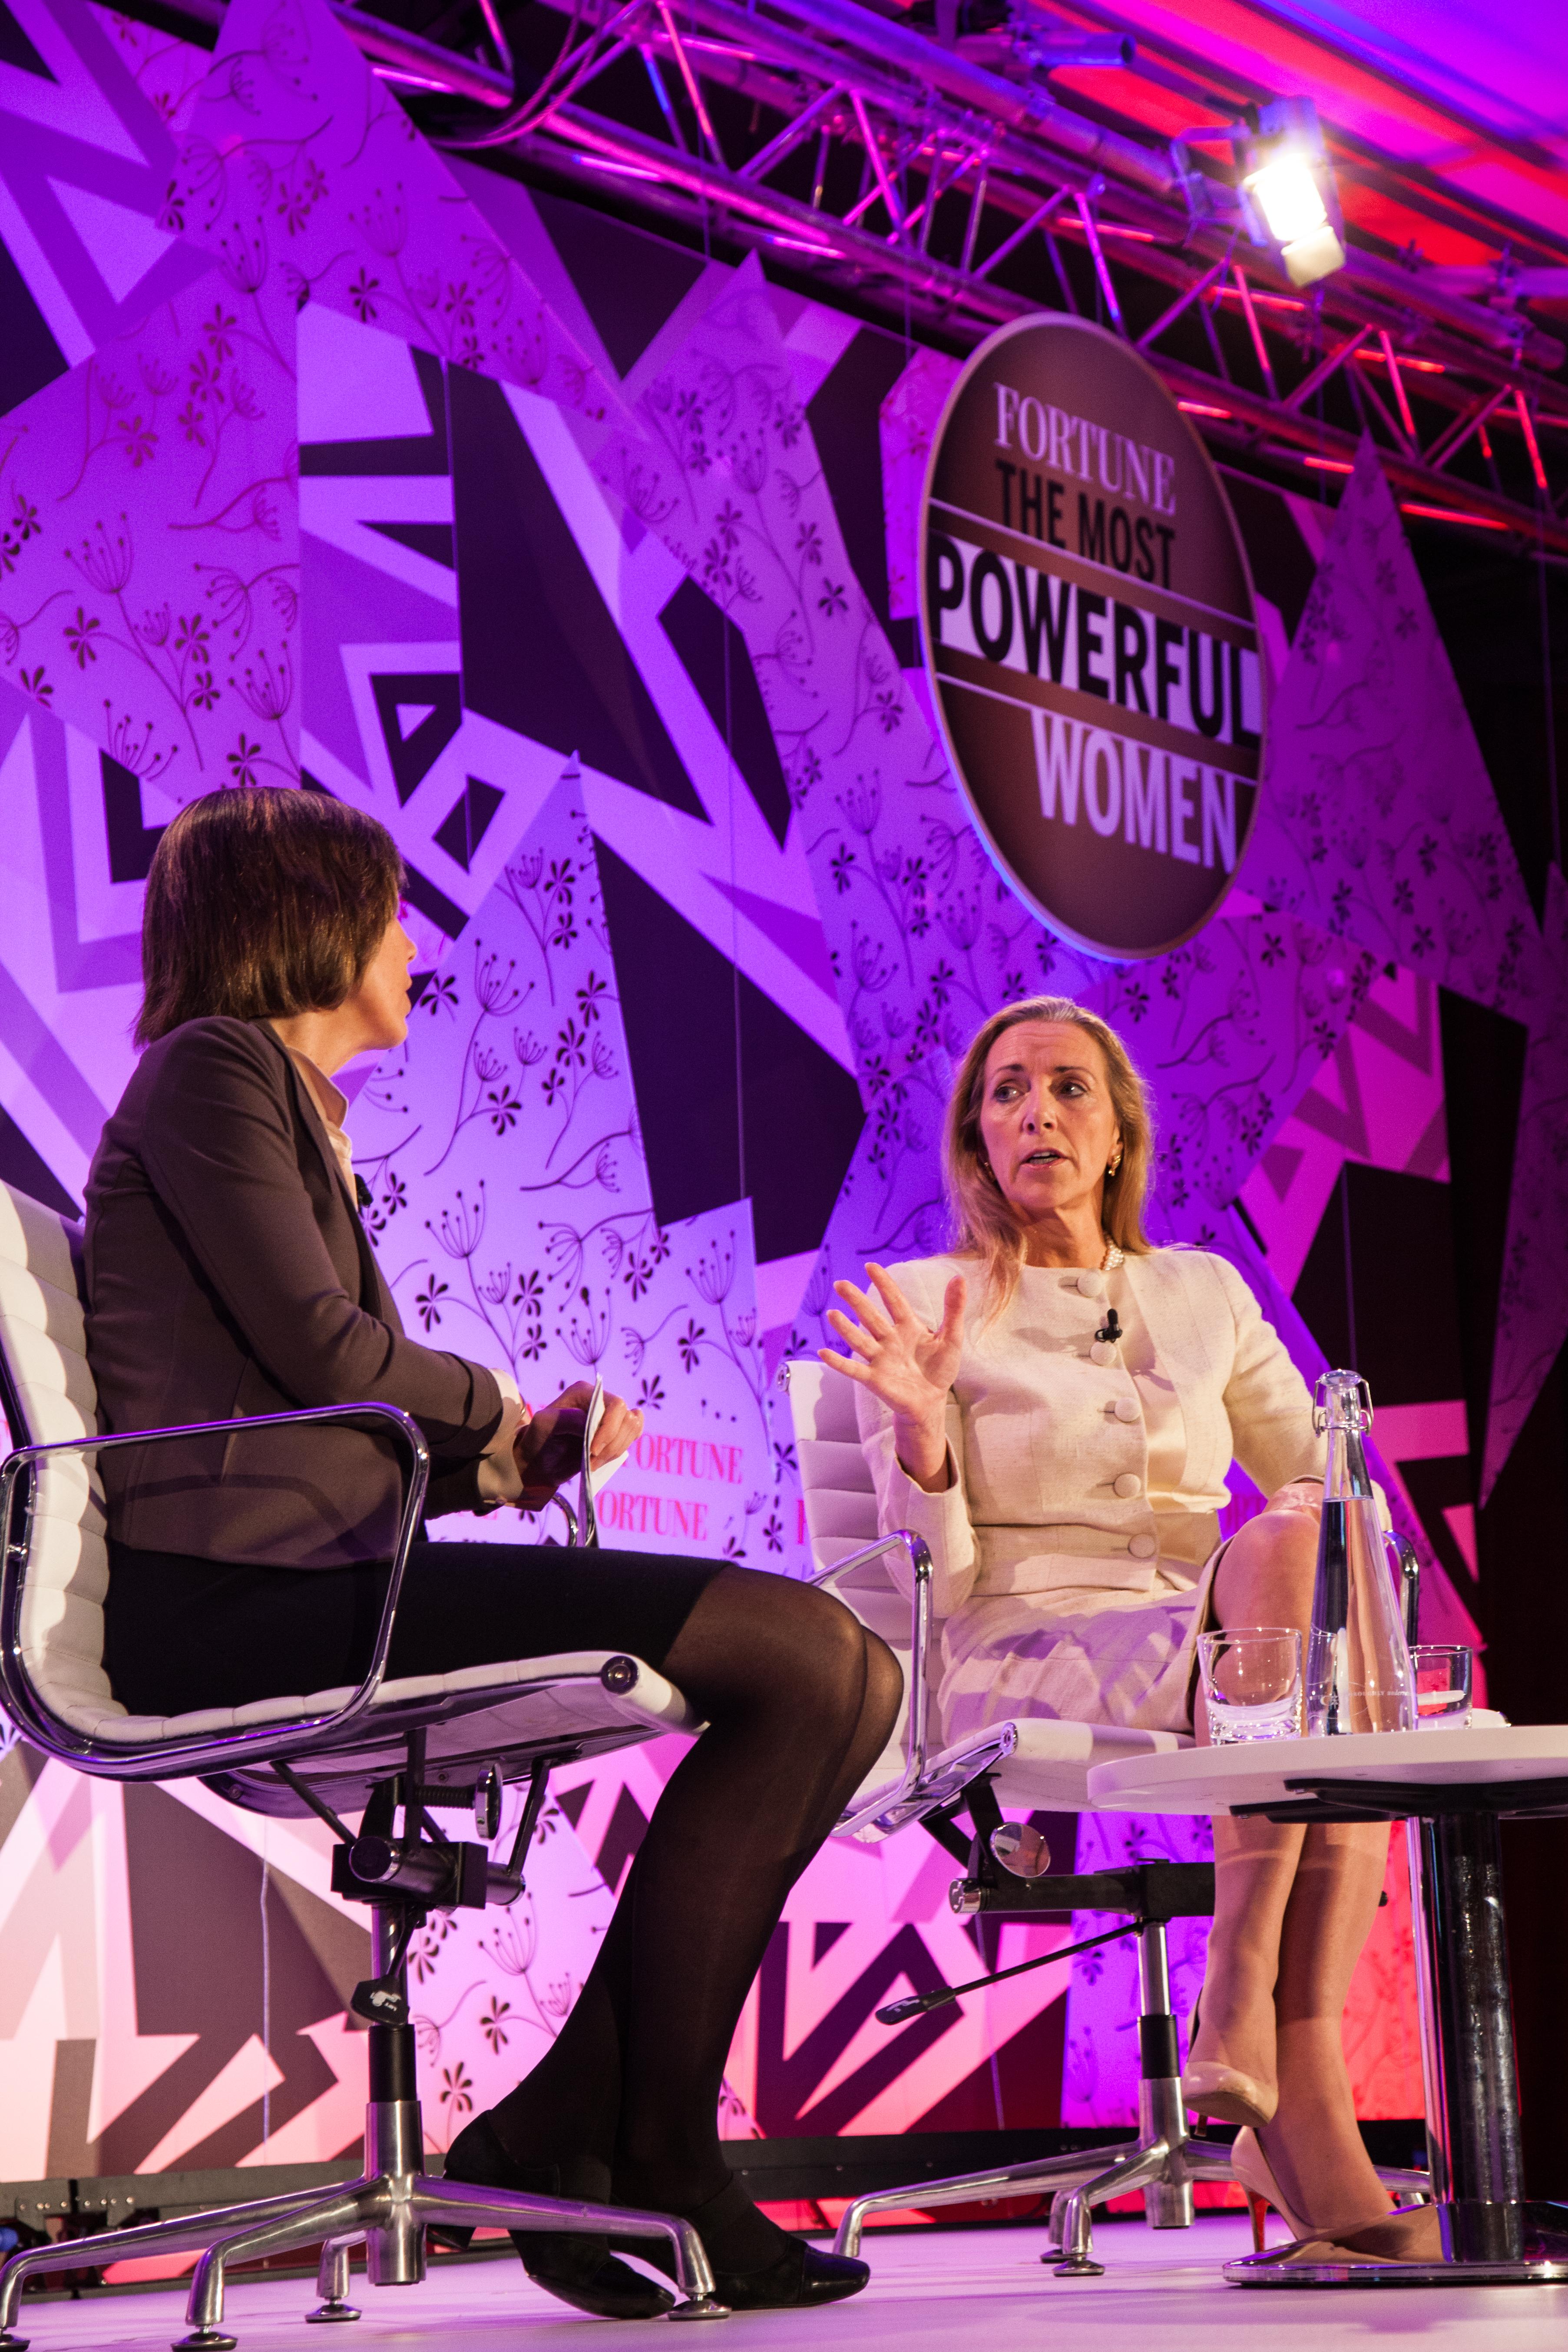 Rona Fairhead, chairman of the BBC Trust, talks to Fortune's Pattie Sellers.